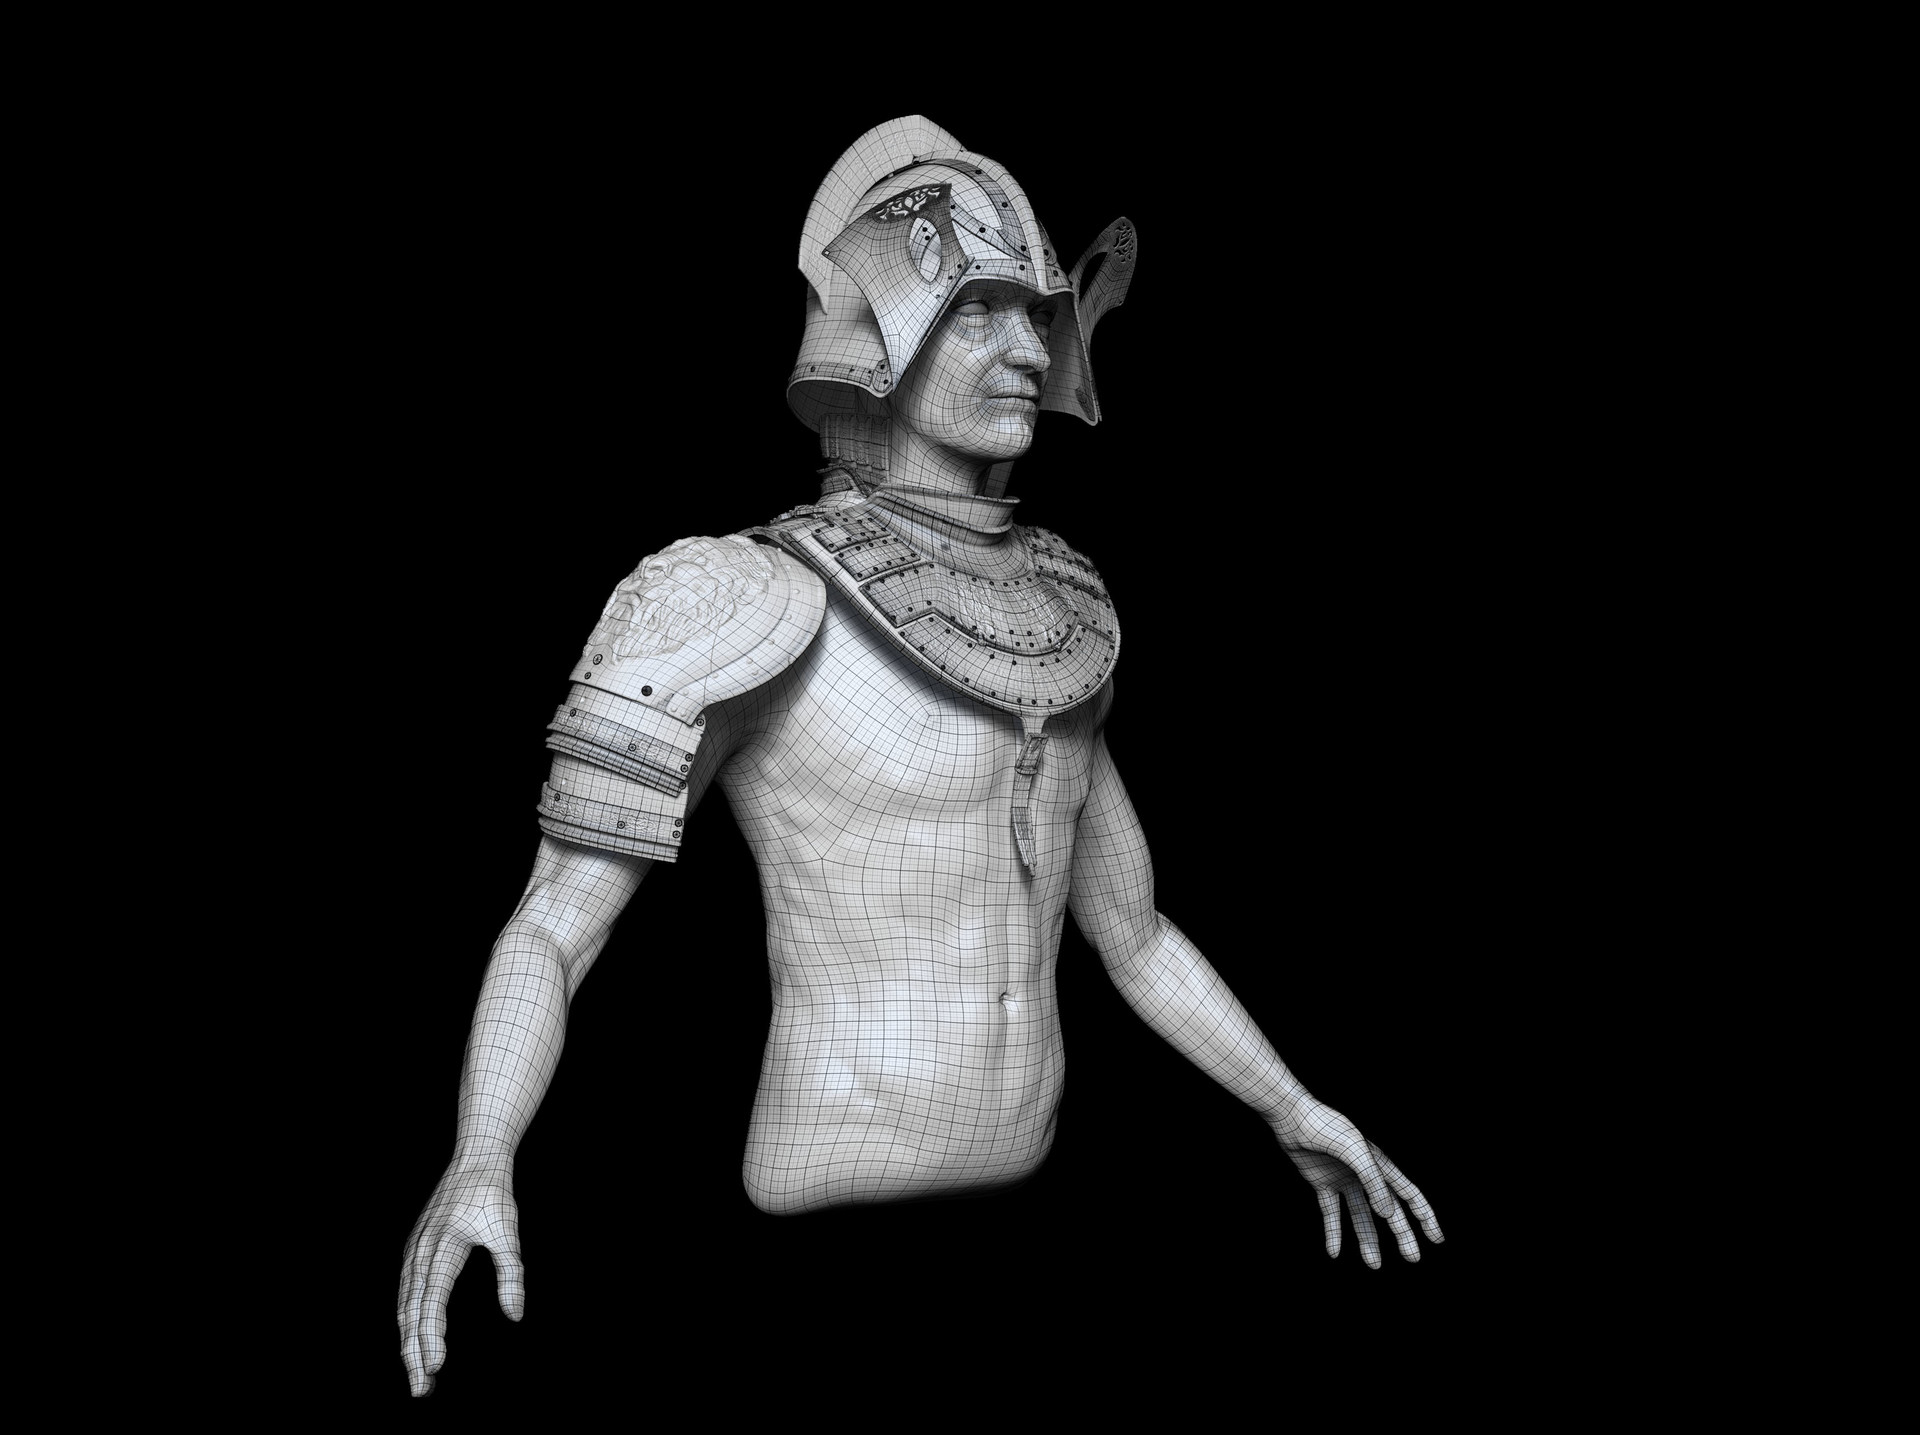 Van Damme Jakob - Lannister armor and torso study